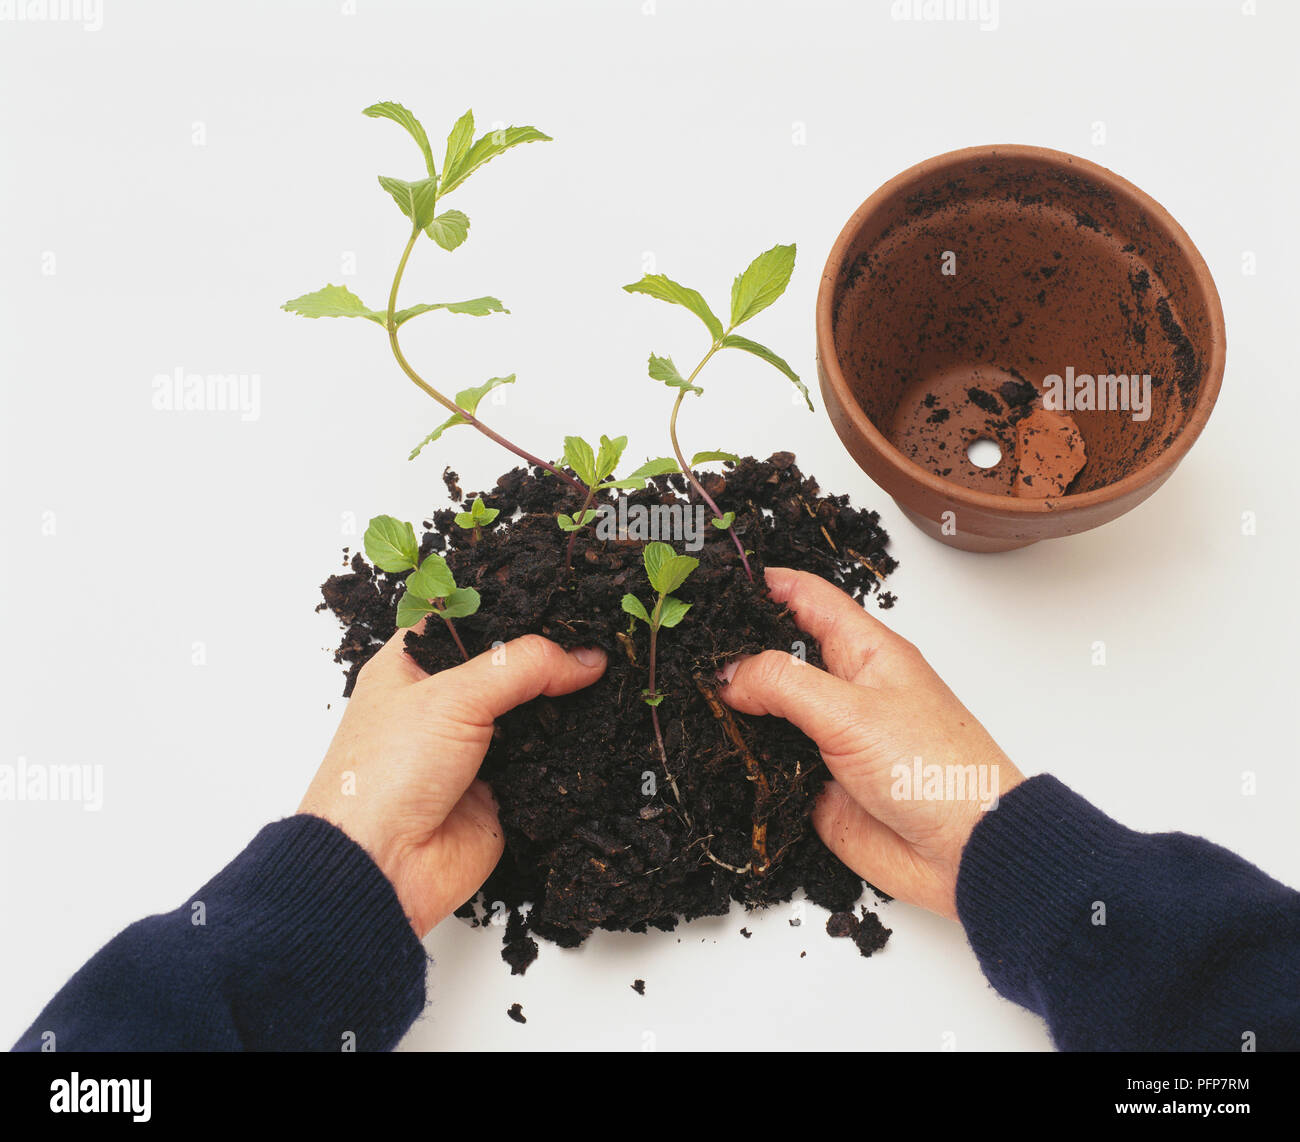 Plant De Menthe En Pot pulling apart mint rhizome seedlings in compost near plant